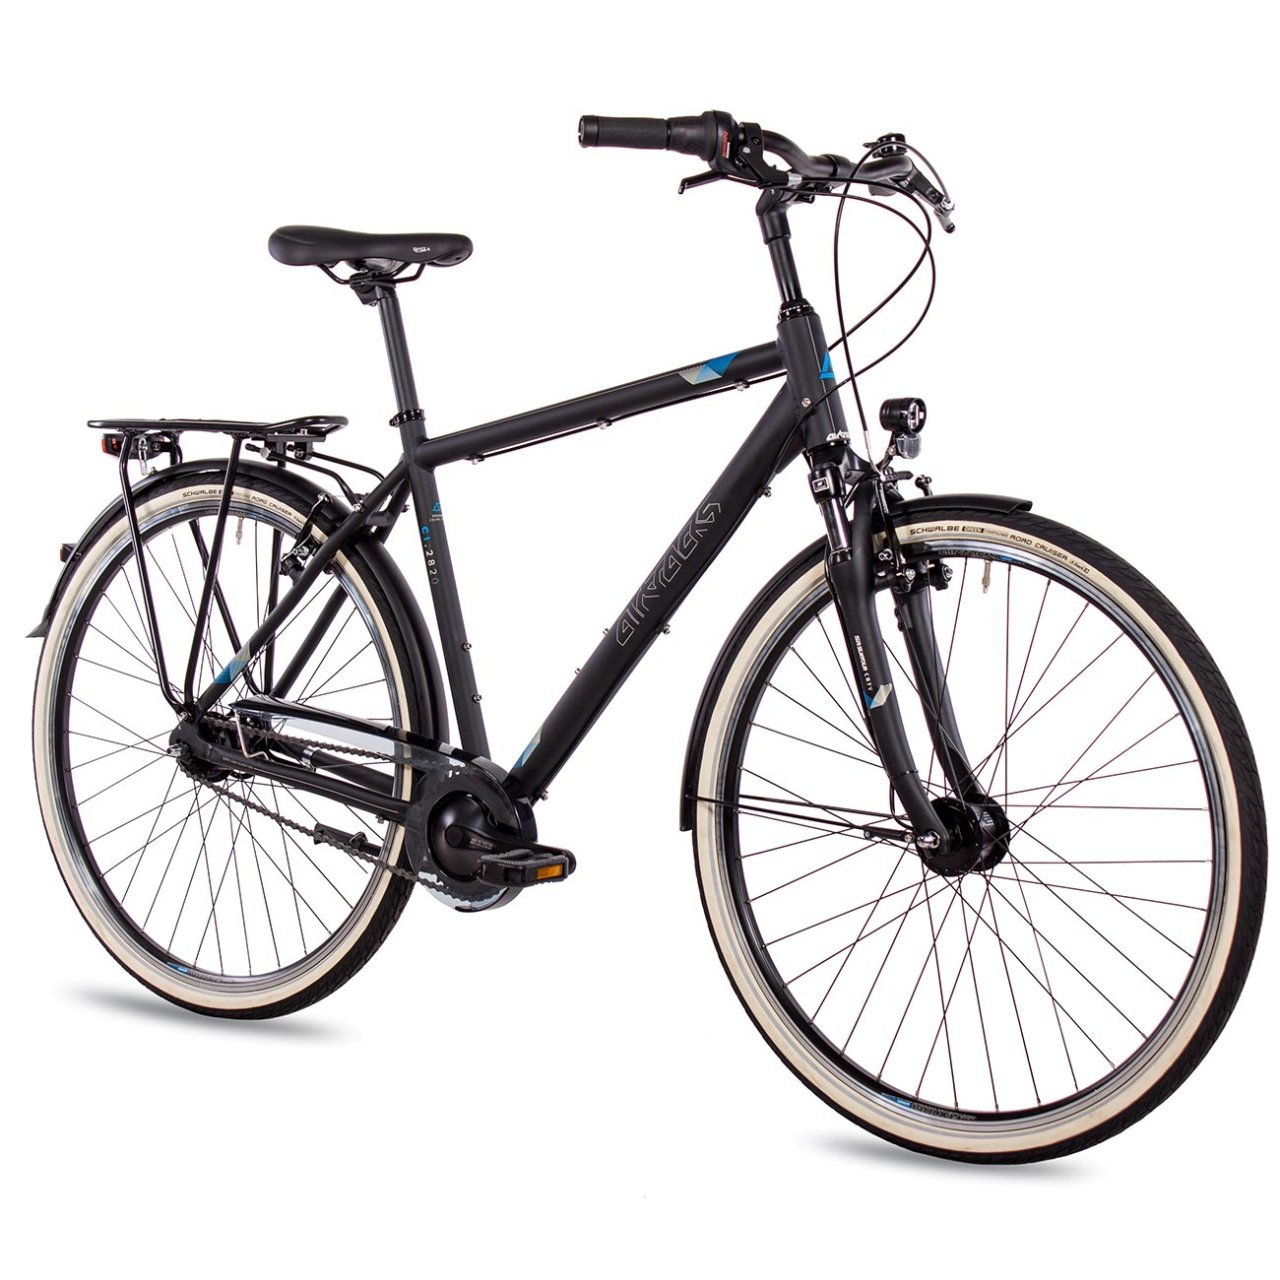 Korb Fahrrad-Licht Damen Multibrand Probike 28 Zoll City Fahrrad Shimano 7 Gang Herren geeignet ab 170-185 cm